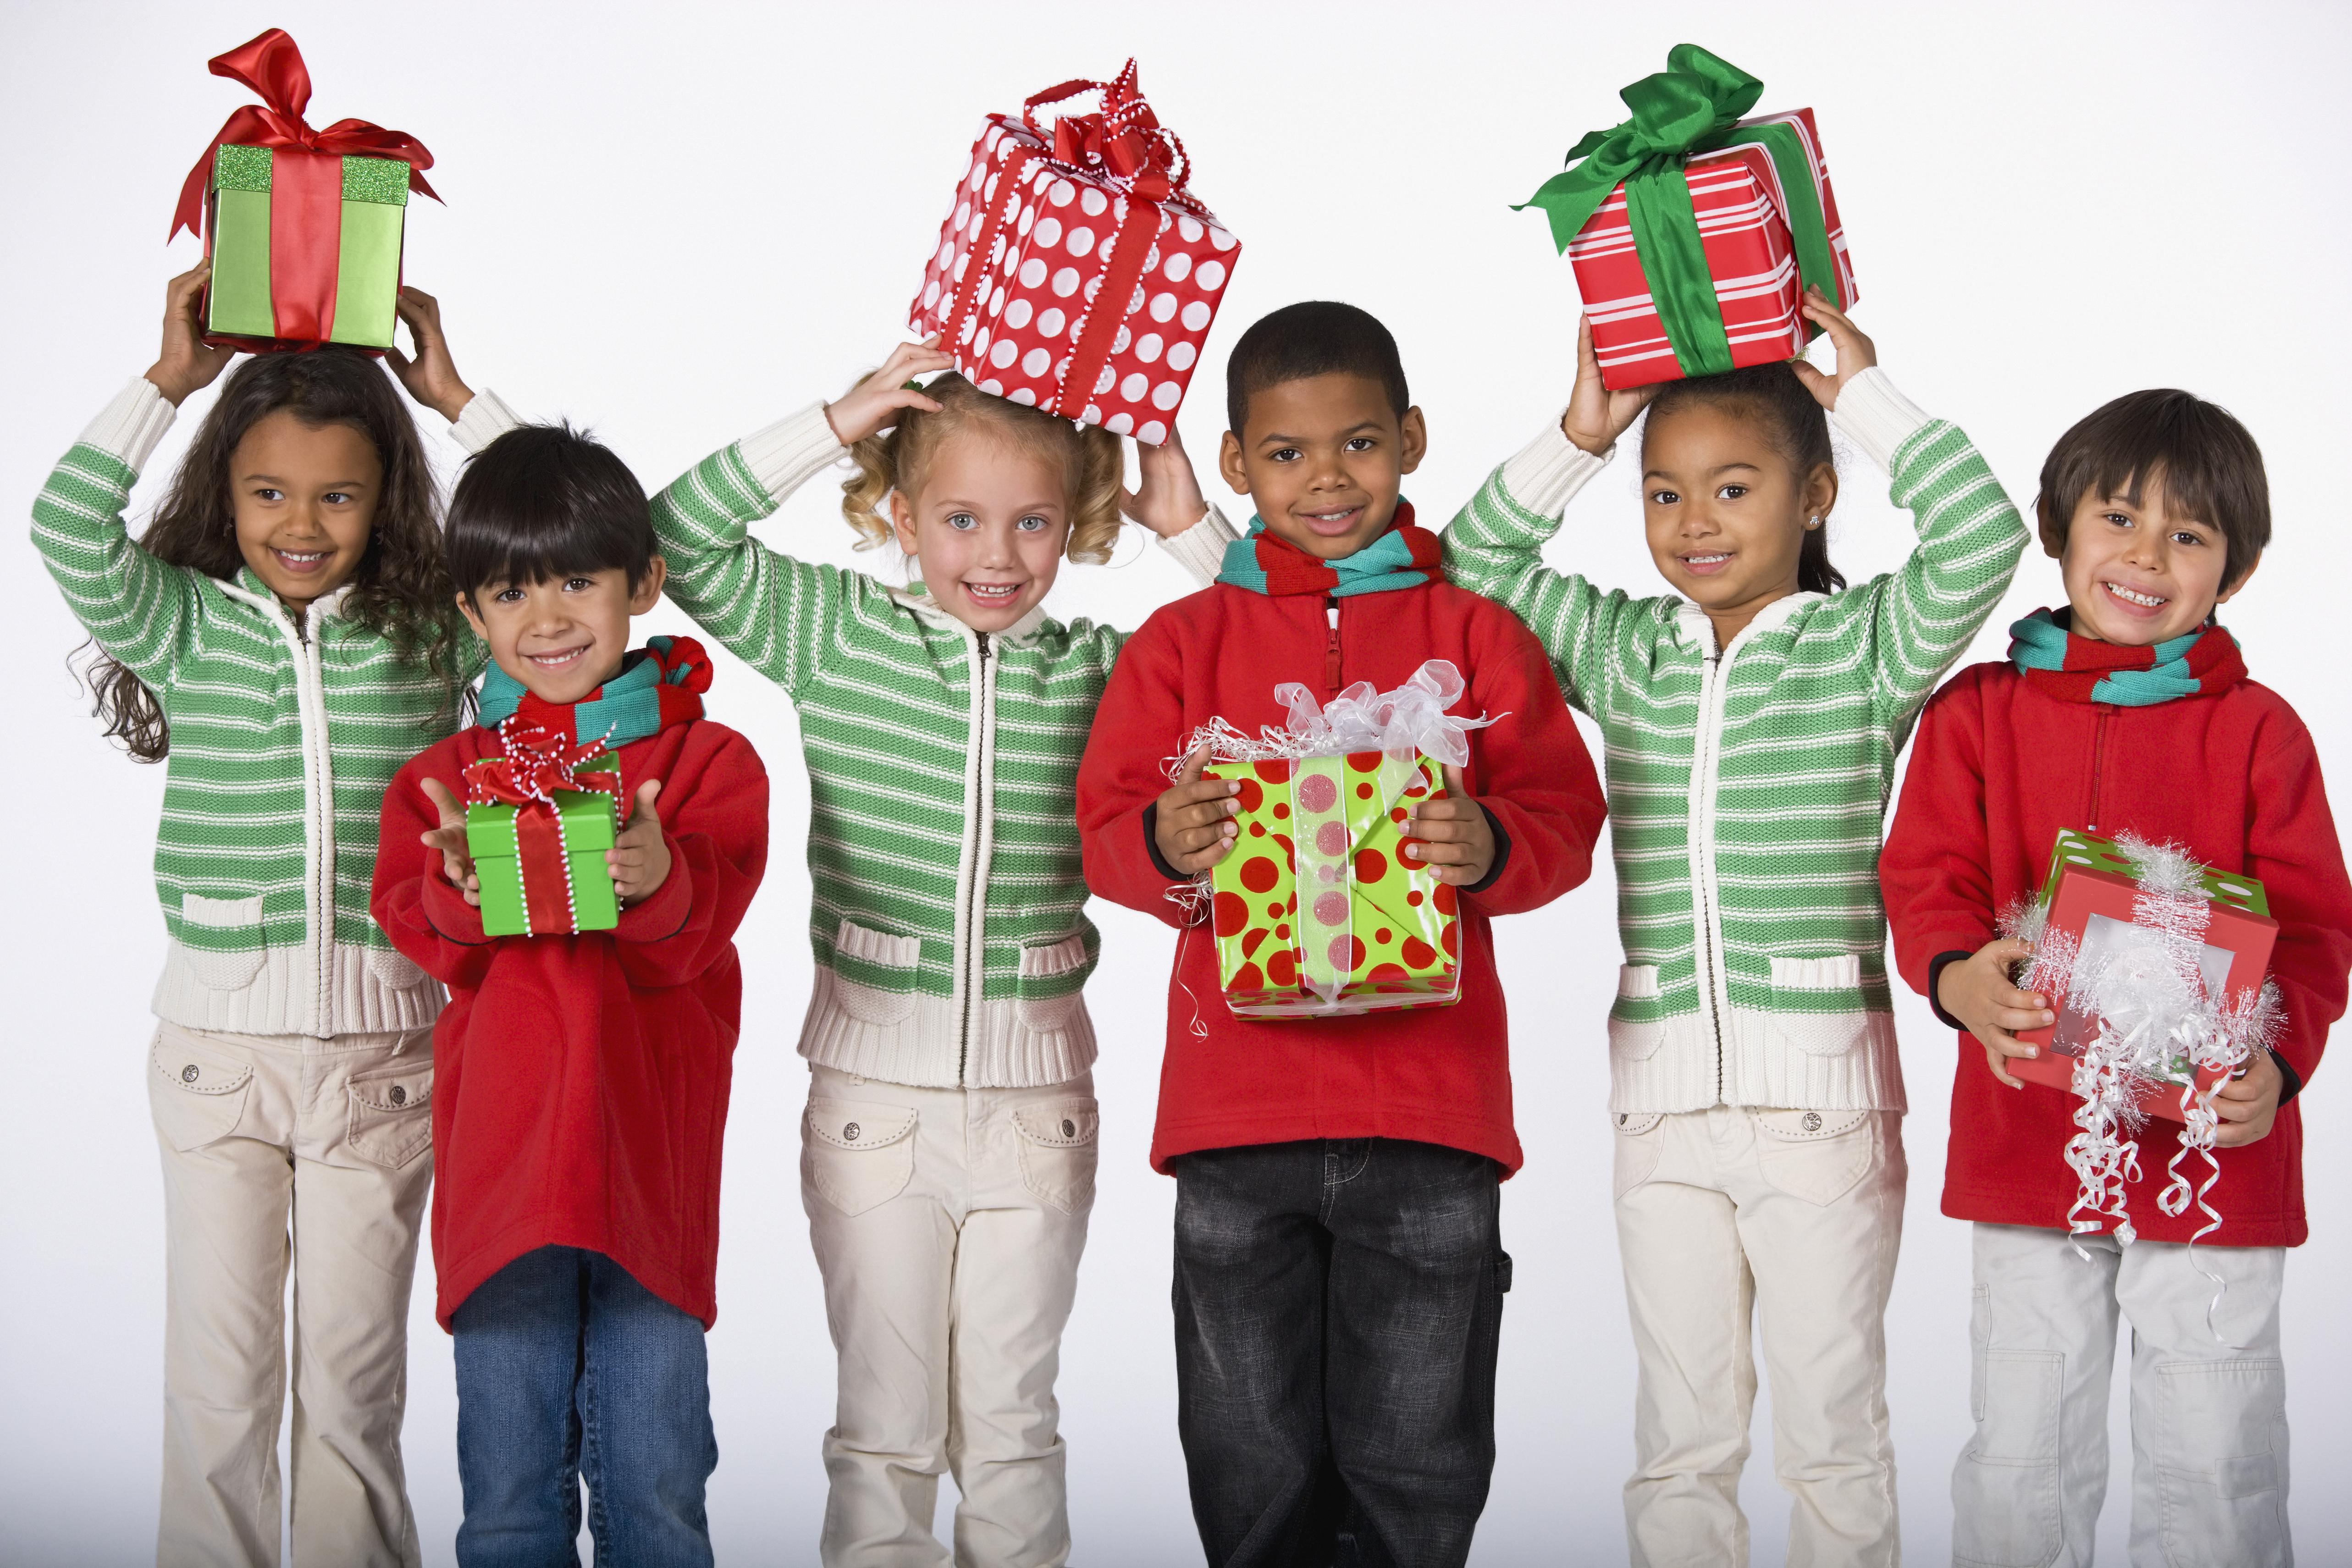 Multi-ethnic children holding Christmas gifts